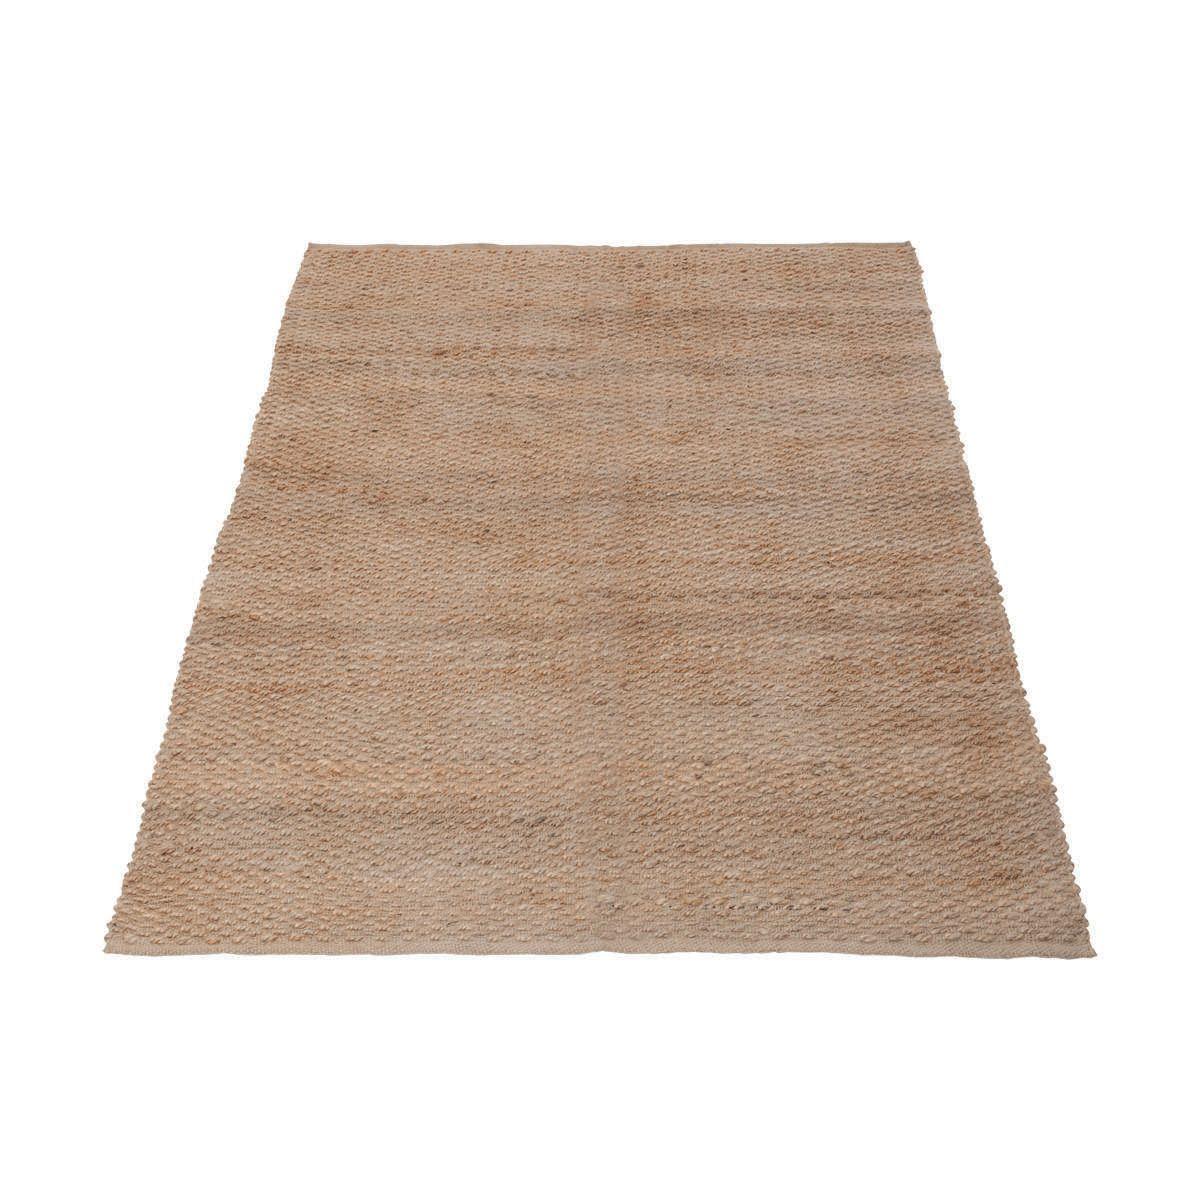 Juteteppich Kmart In 2020 Jute Rug Rugs Rugs On Carpet